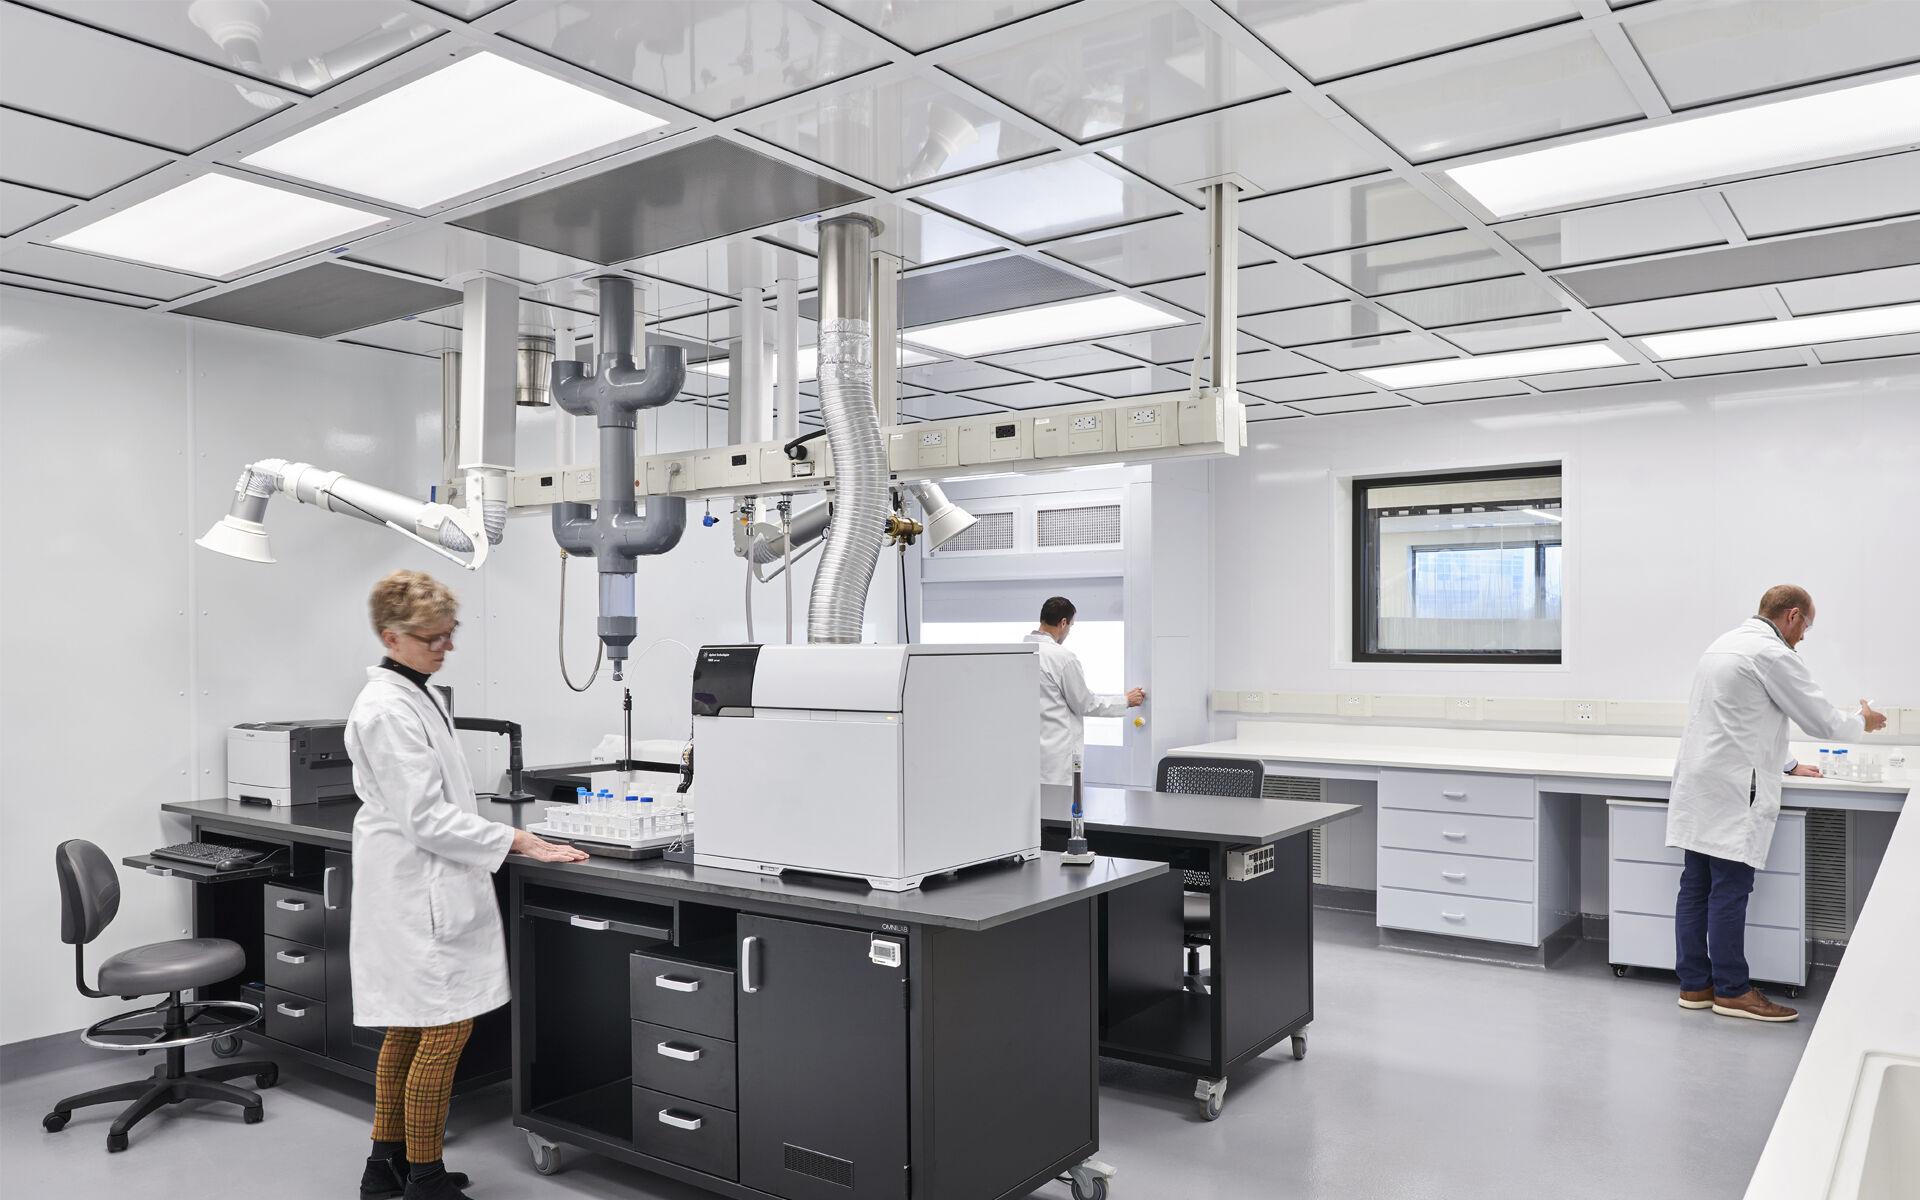 Laboratory Relocation - Food & Drug Administration